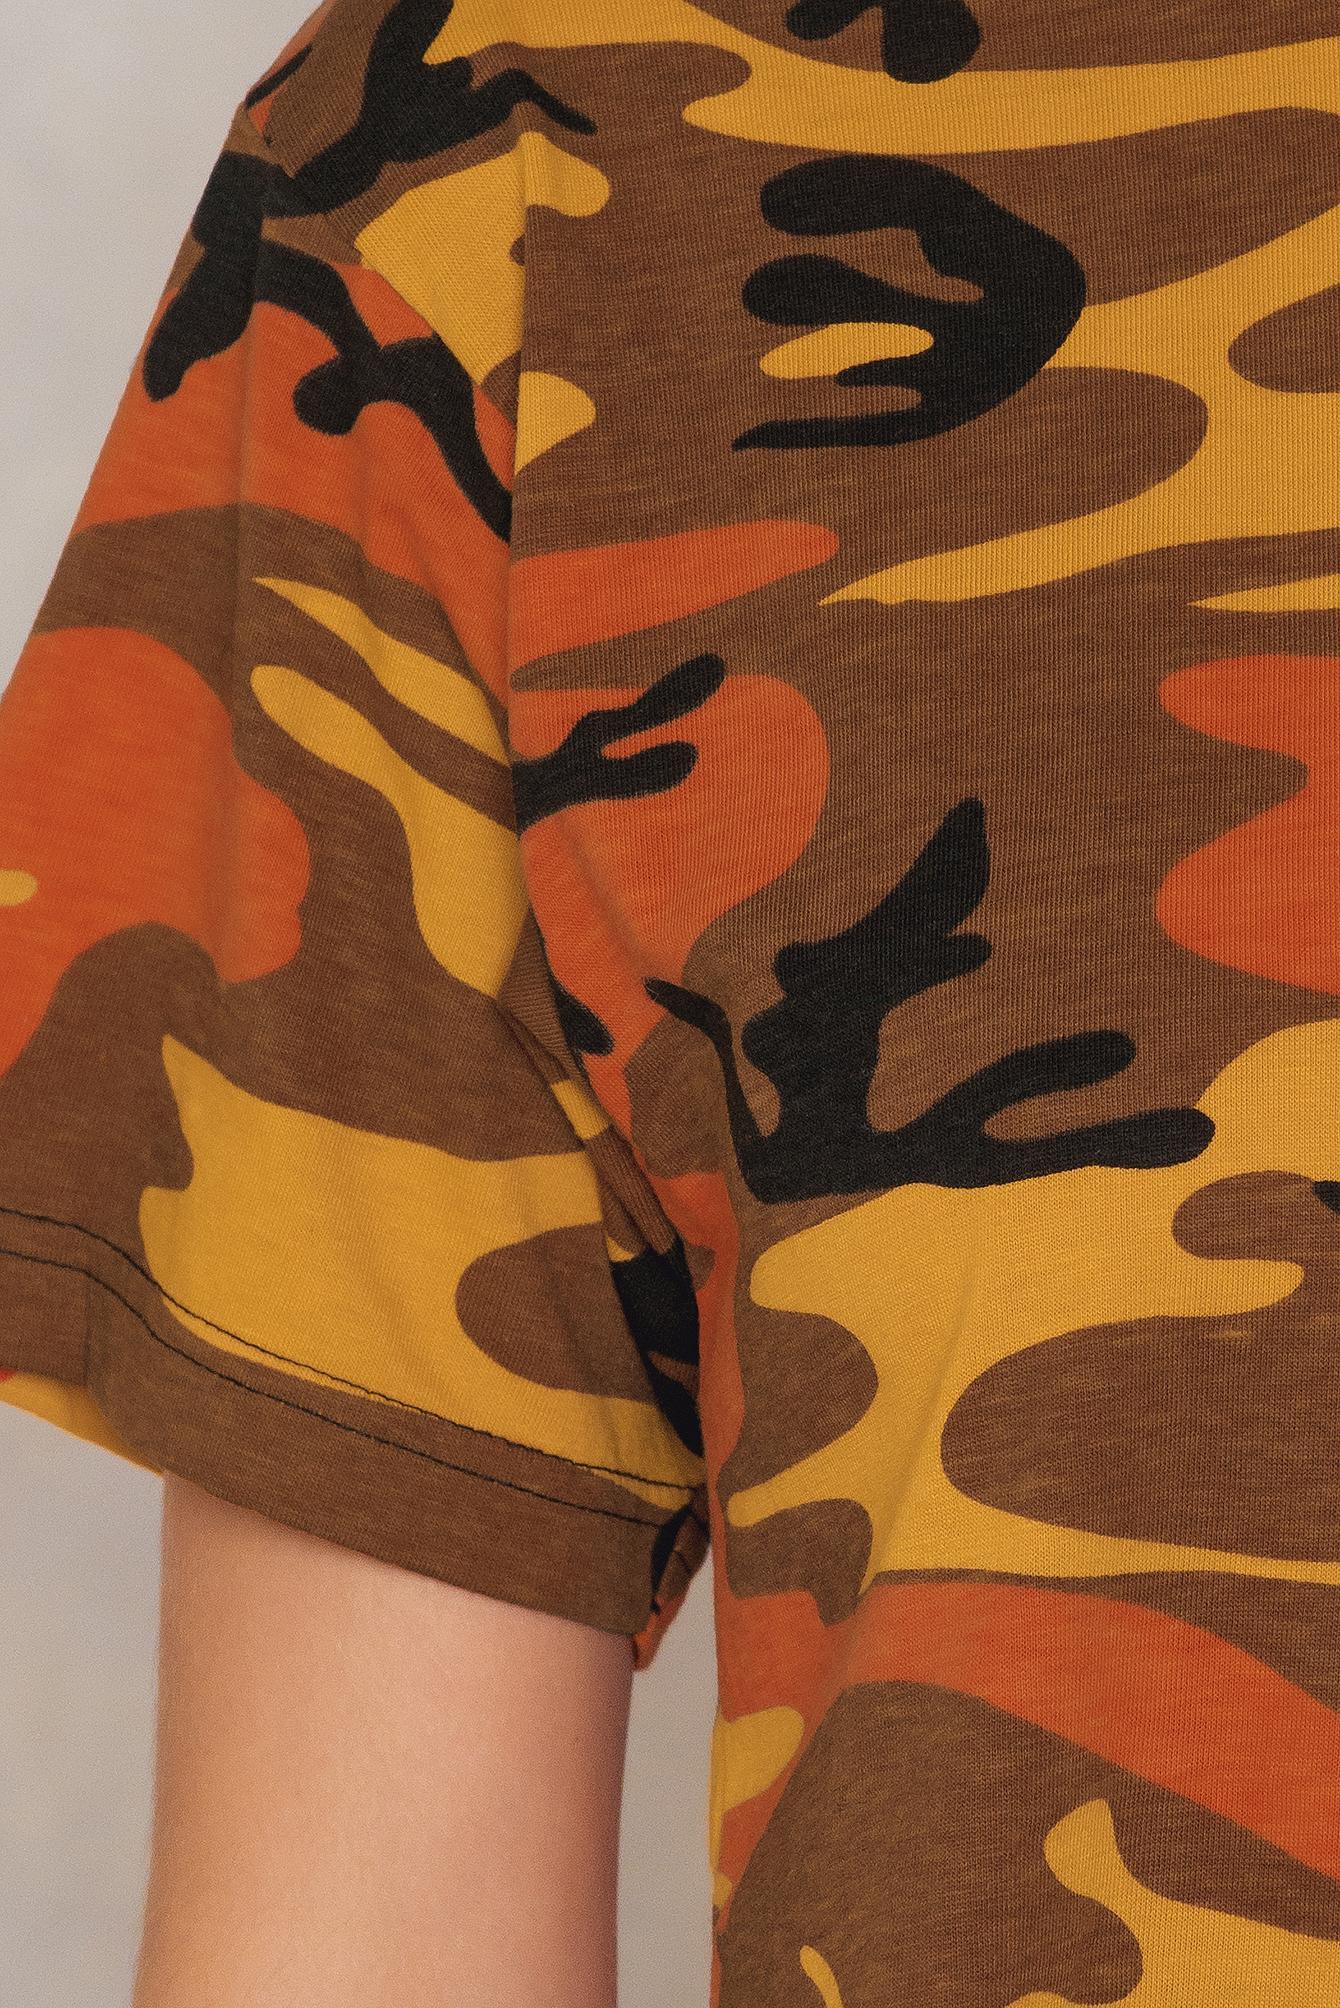 Leah Kirsch Cotton Camo Crop Top in Orange